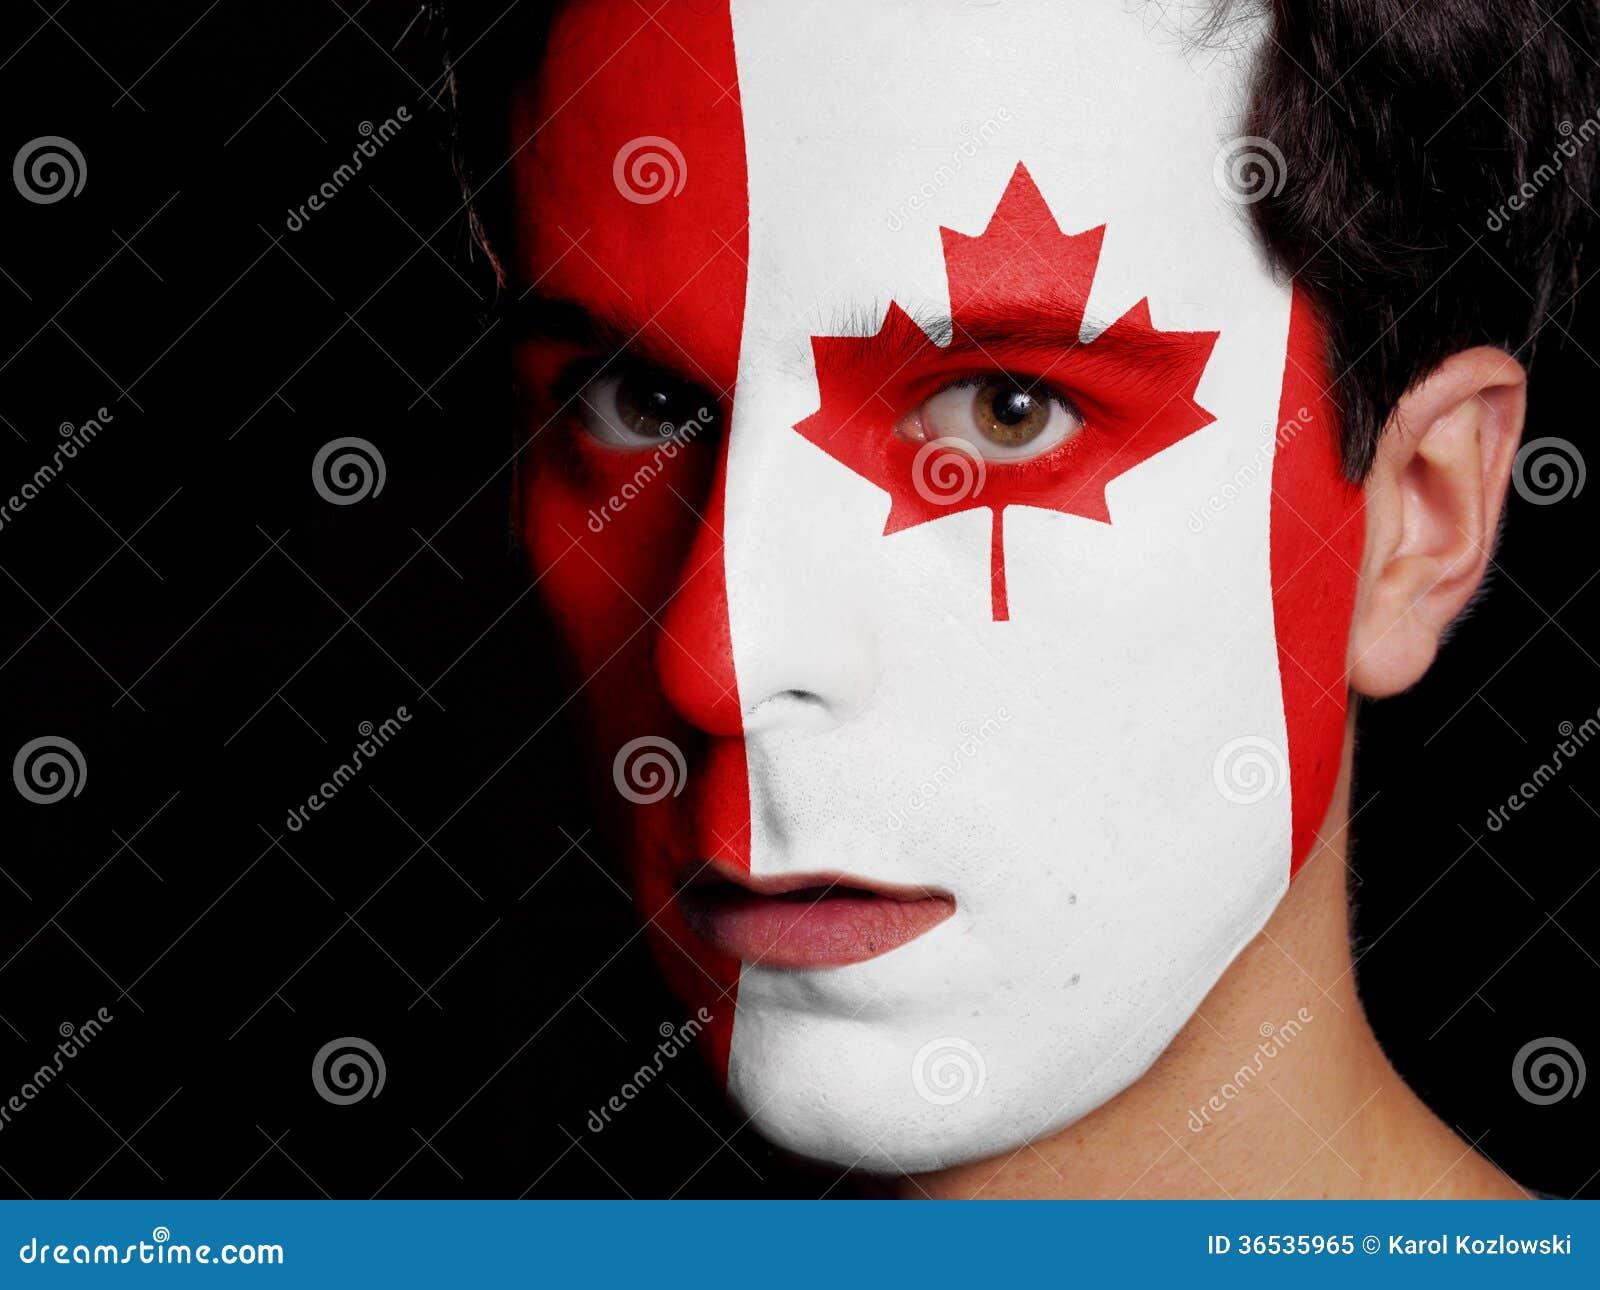 flag of canada royalty free stock photo image 36535965